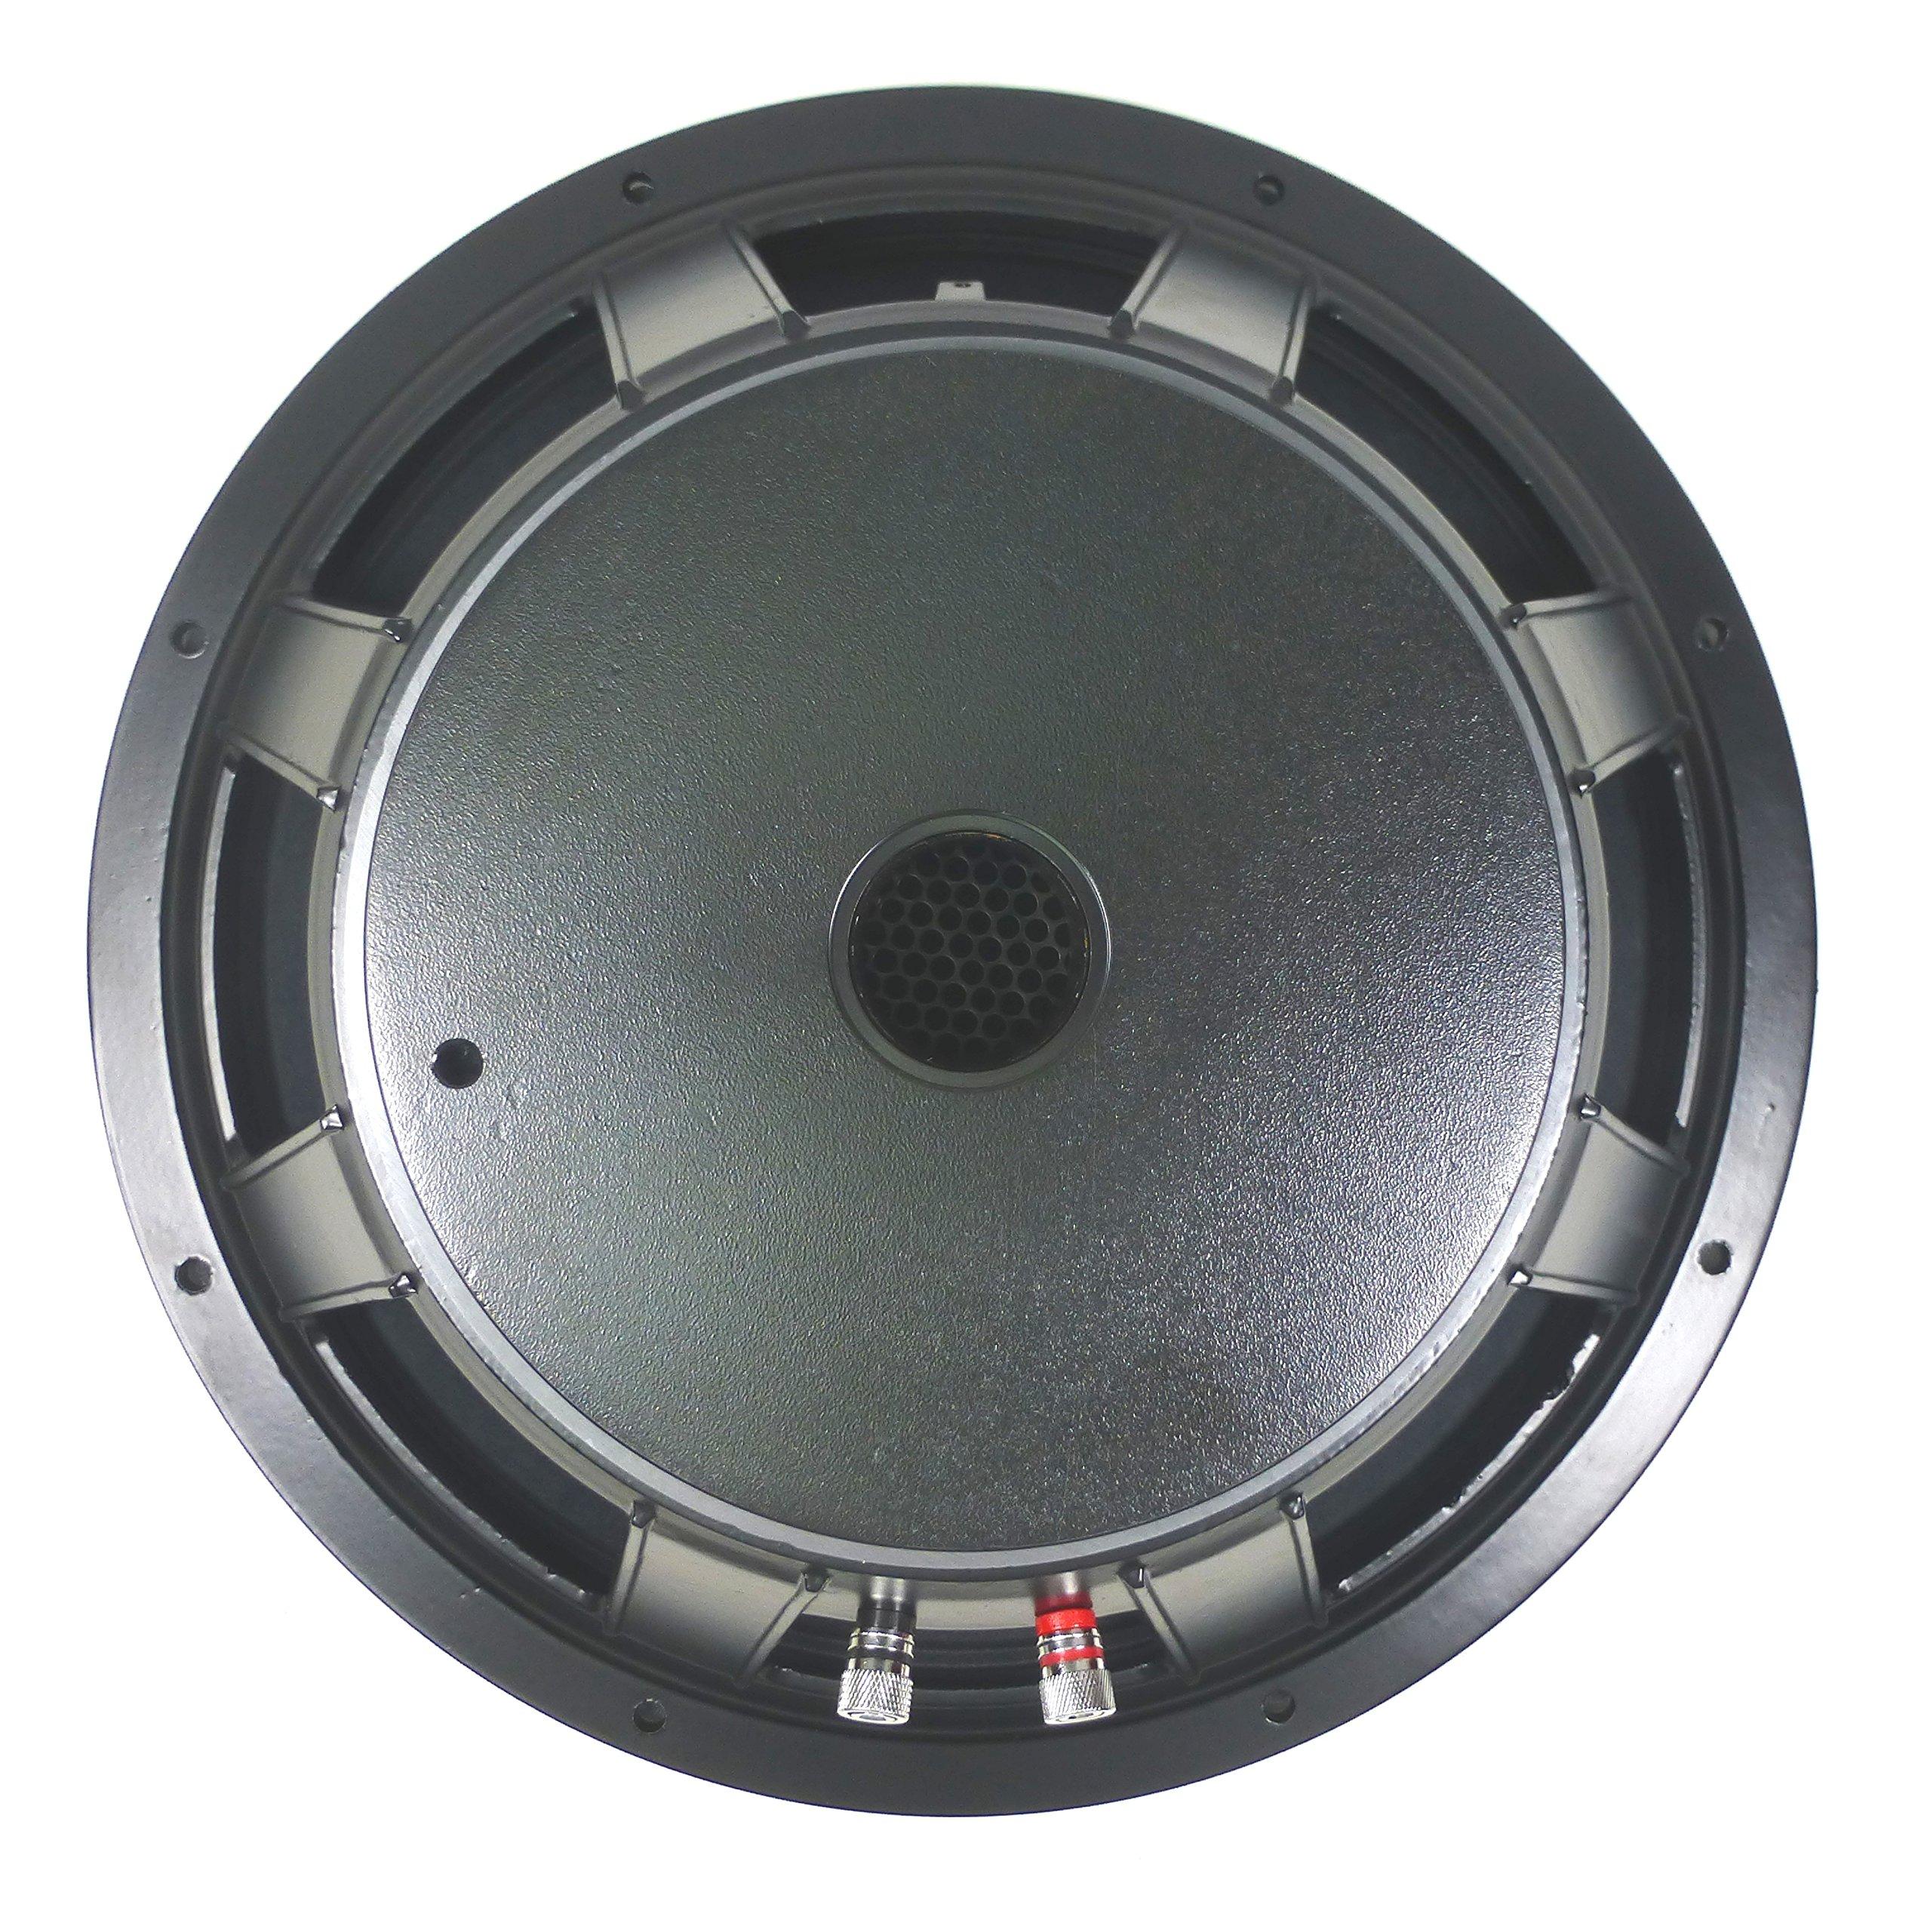 Replacement Speaker For Bag End 18'' Woofer EL-18A, S18, D18, Quatrz Series 8Ω